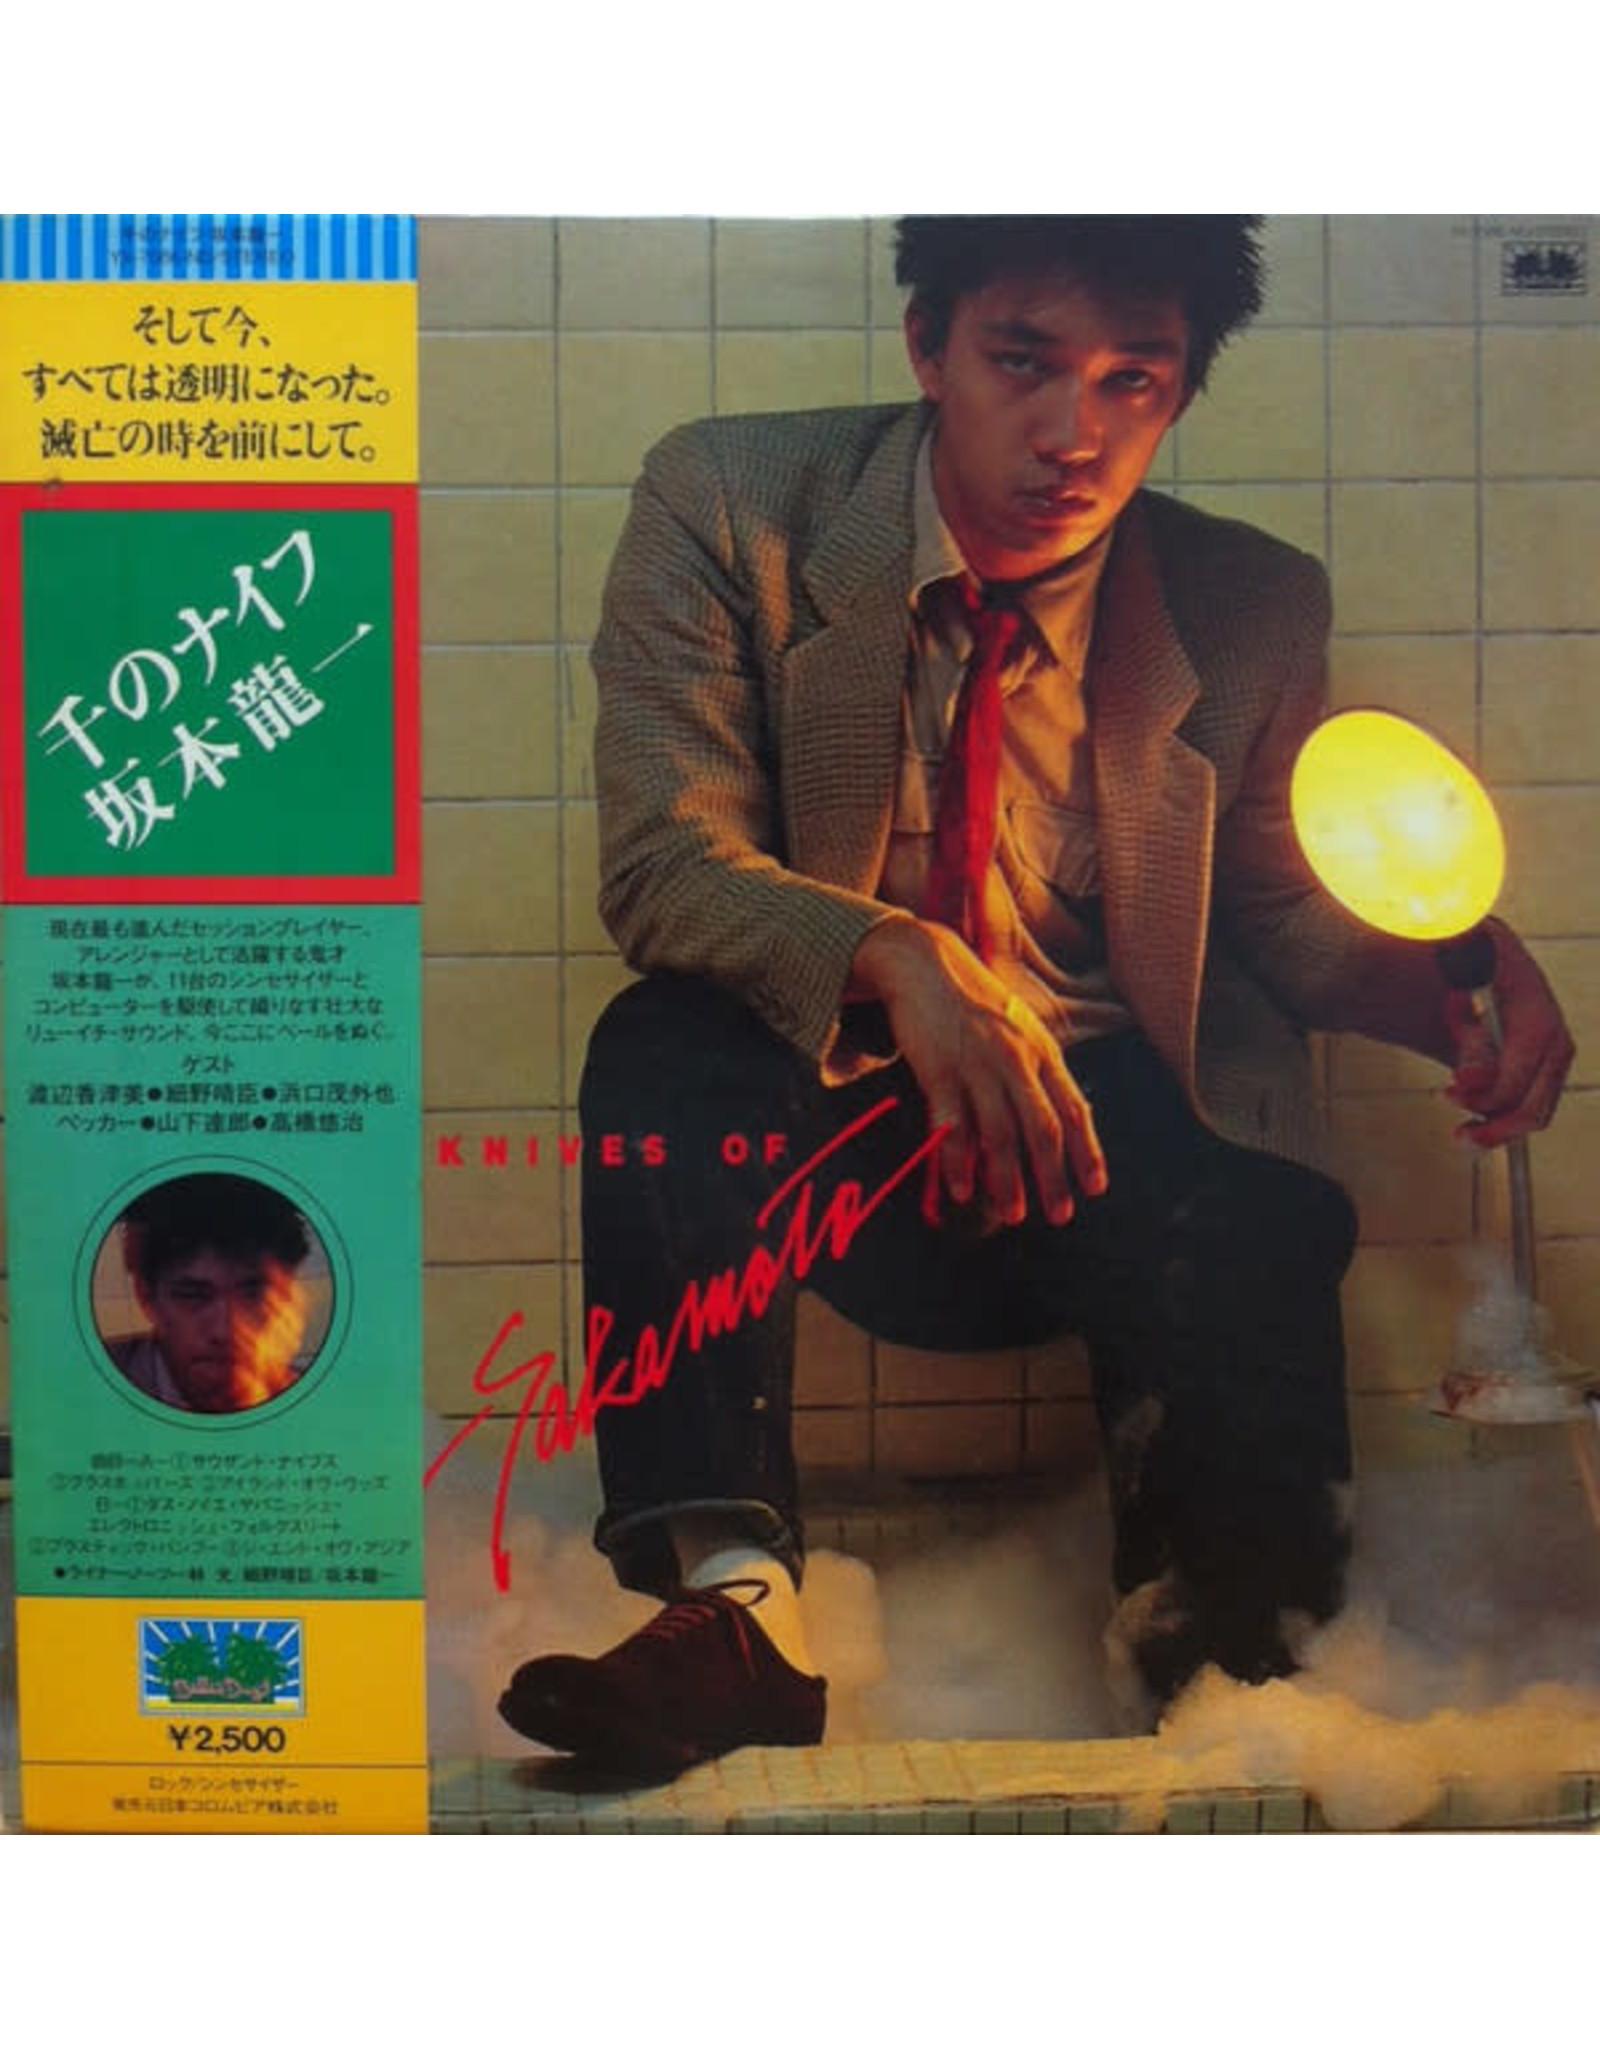 New Vinyl Ryuichi Sakamoto - Thousand Knives Of LP